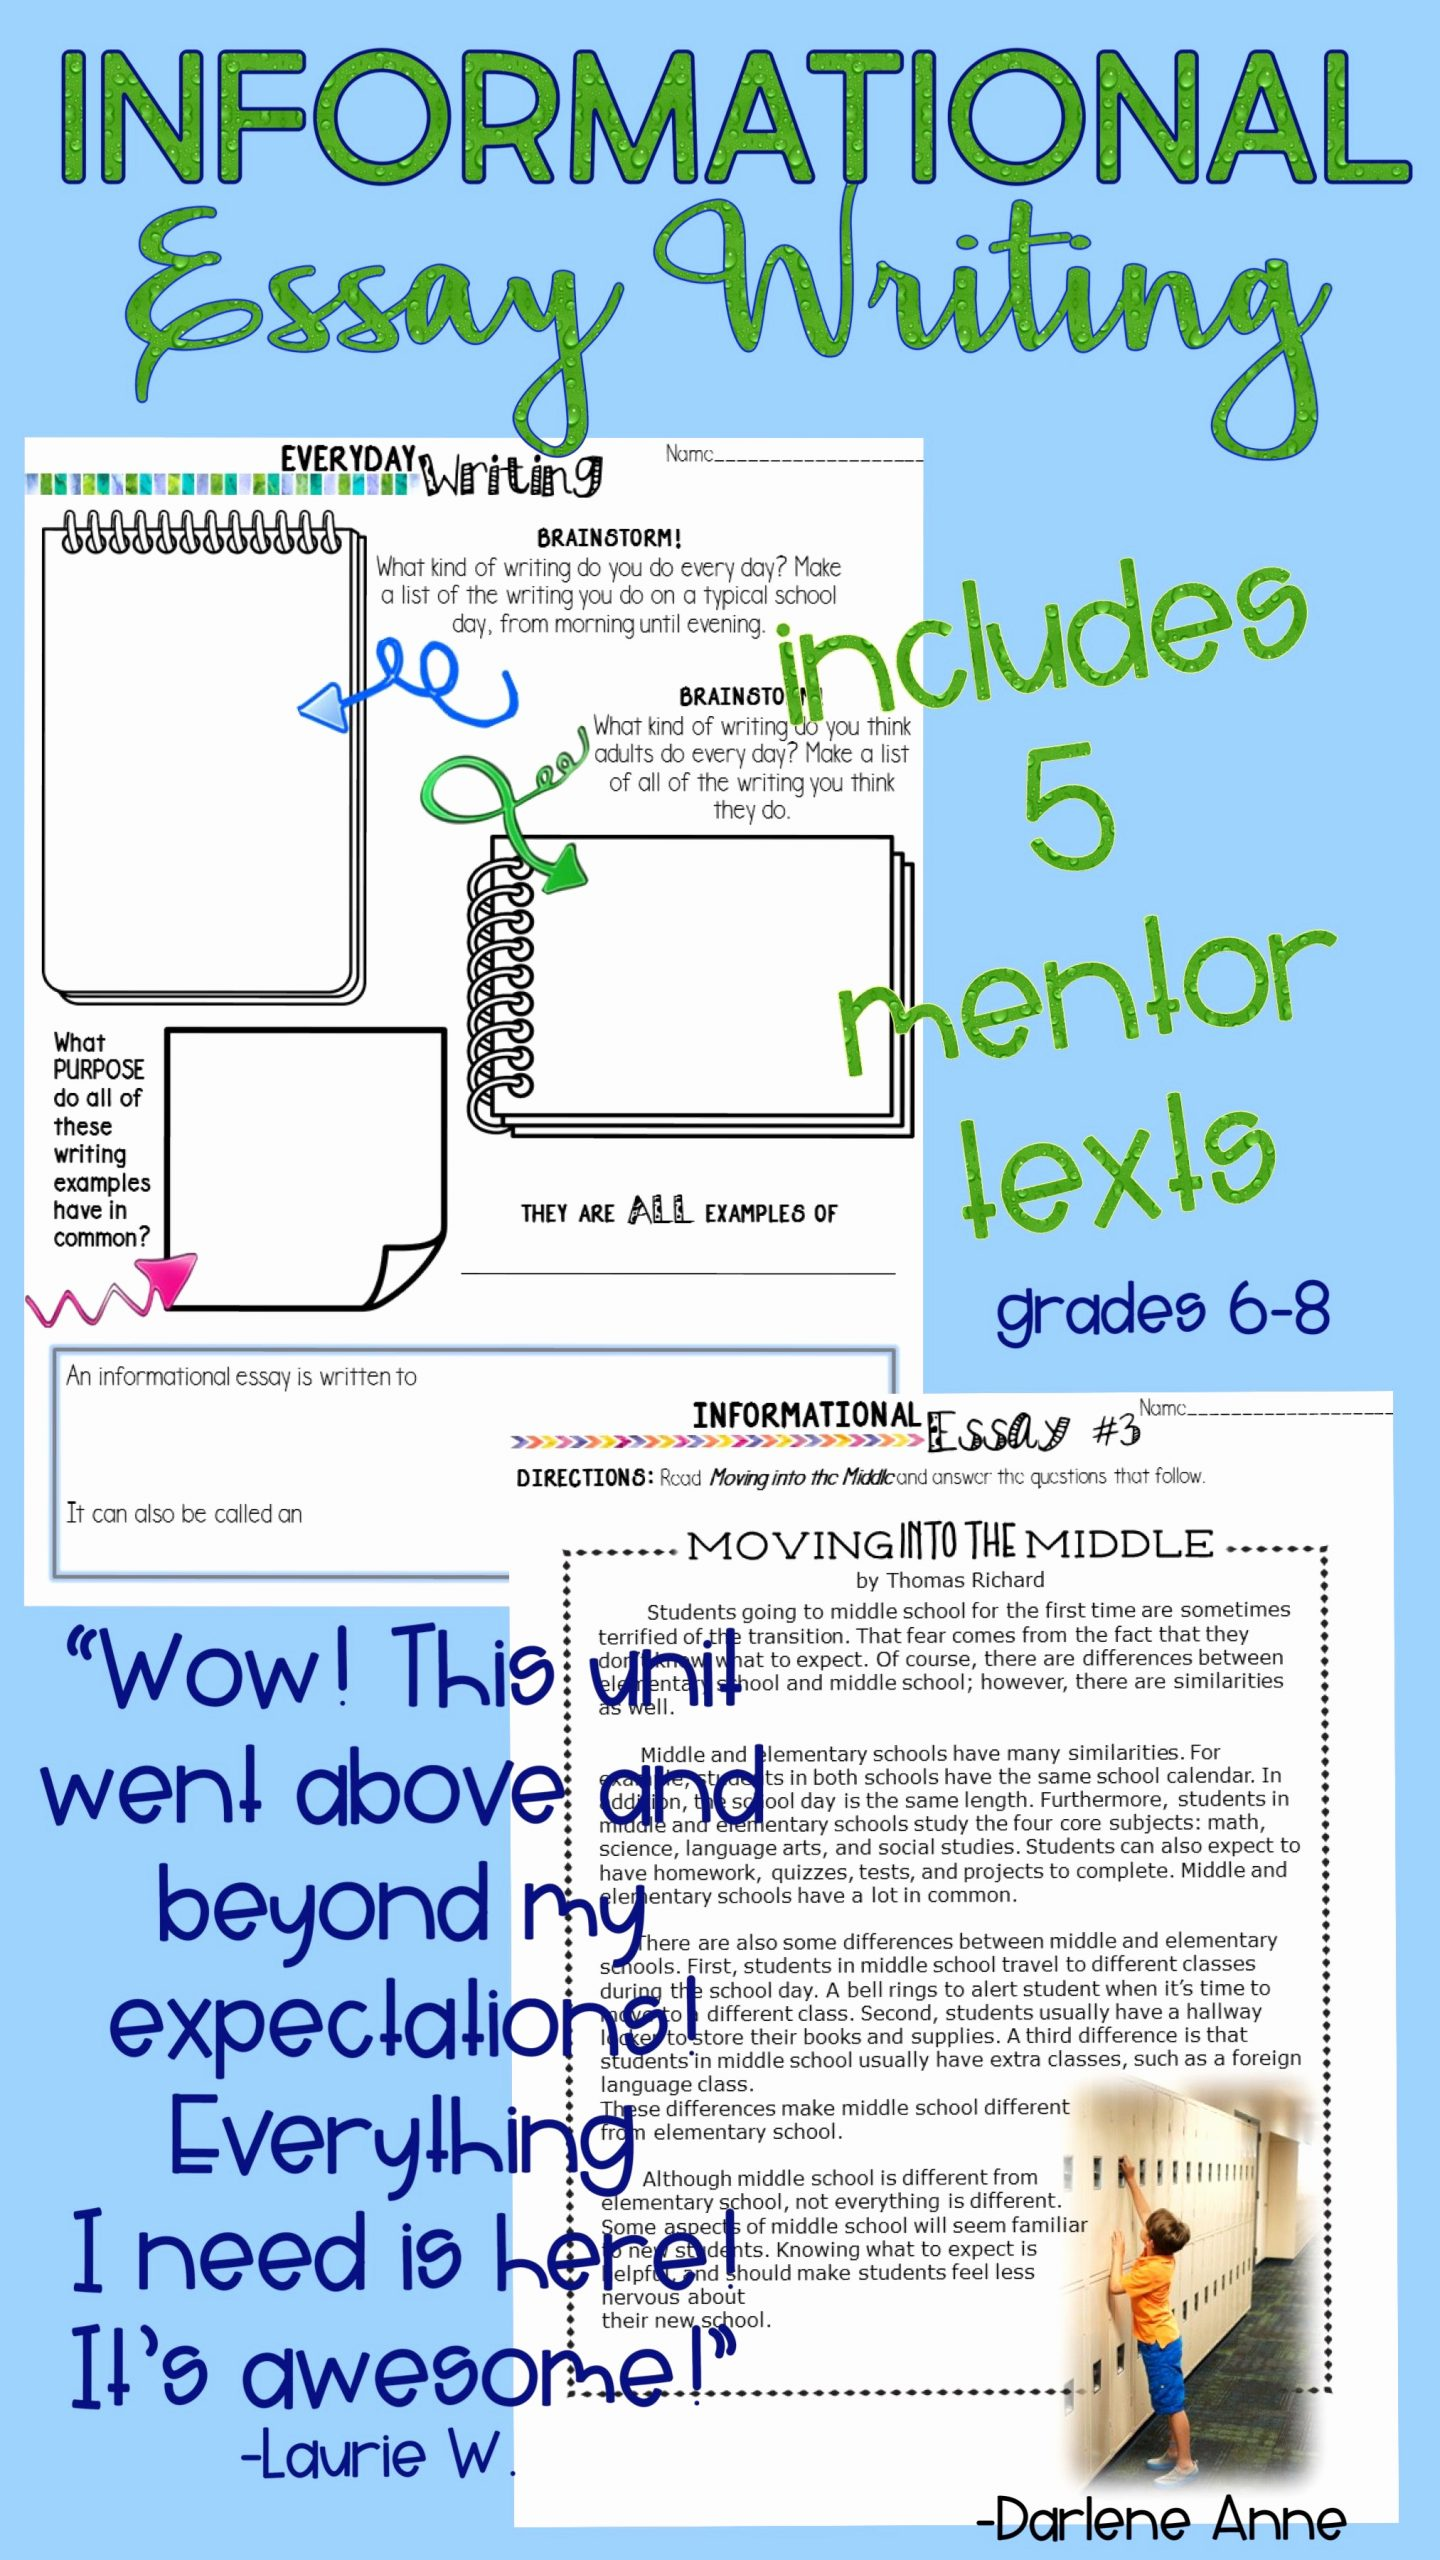 Informational Text Worksheets Middle School New Informational Writing Workshop for Middle School Ela Print